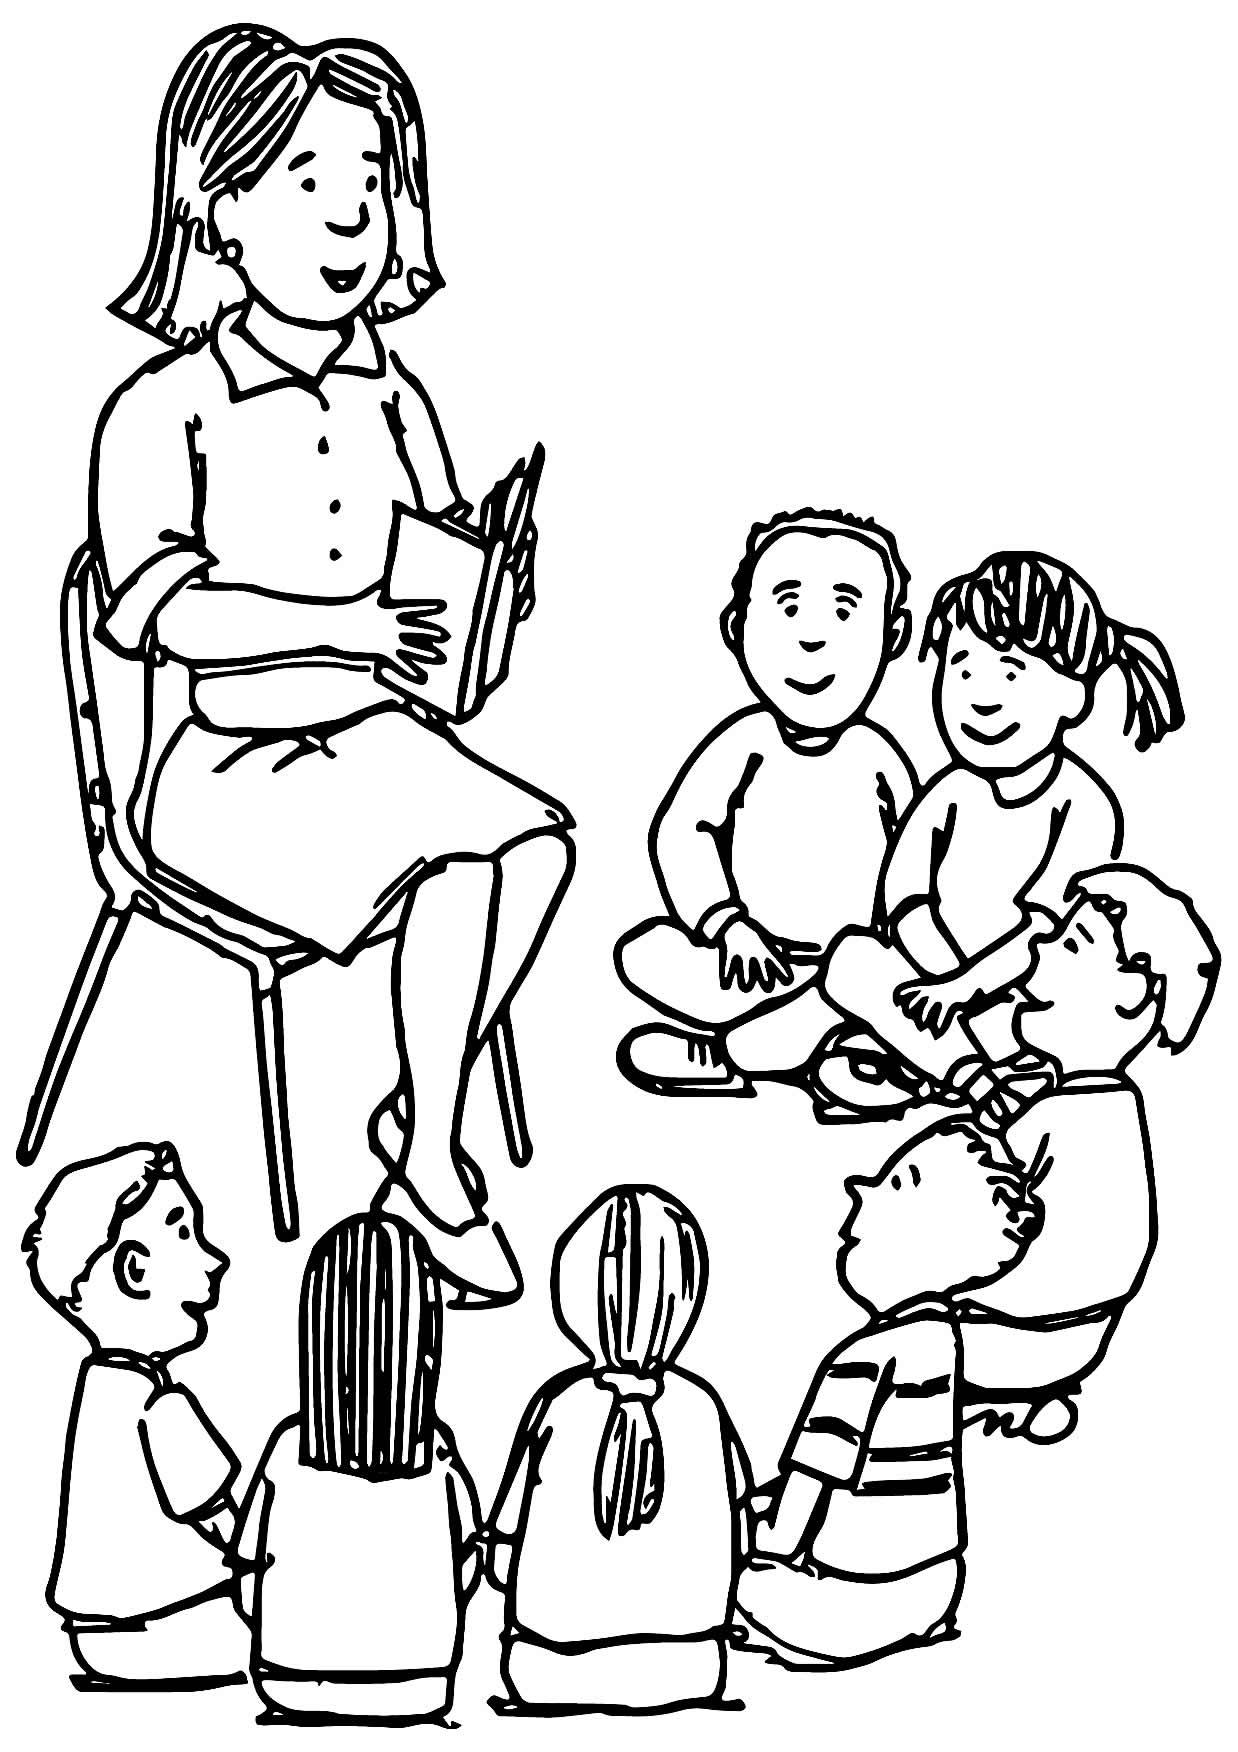 Imagem de professora para colorir